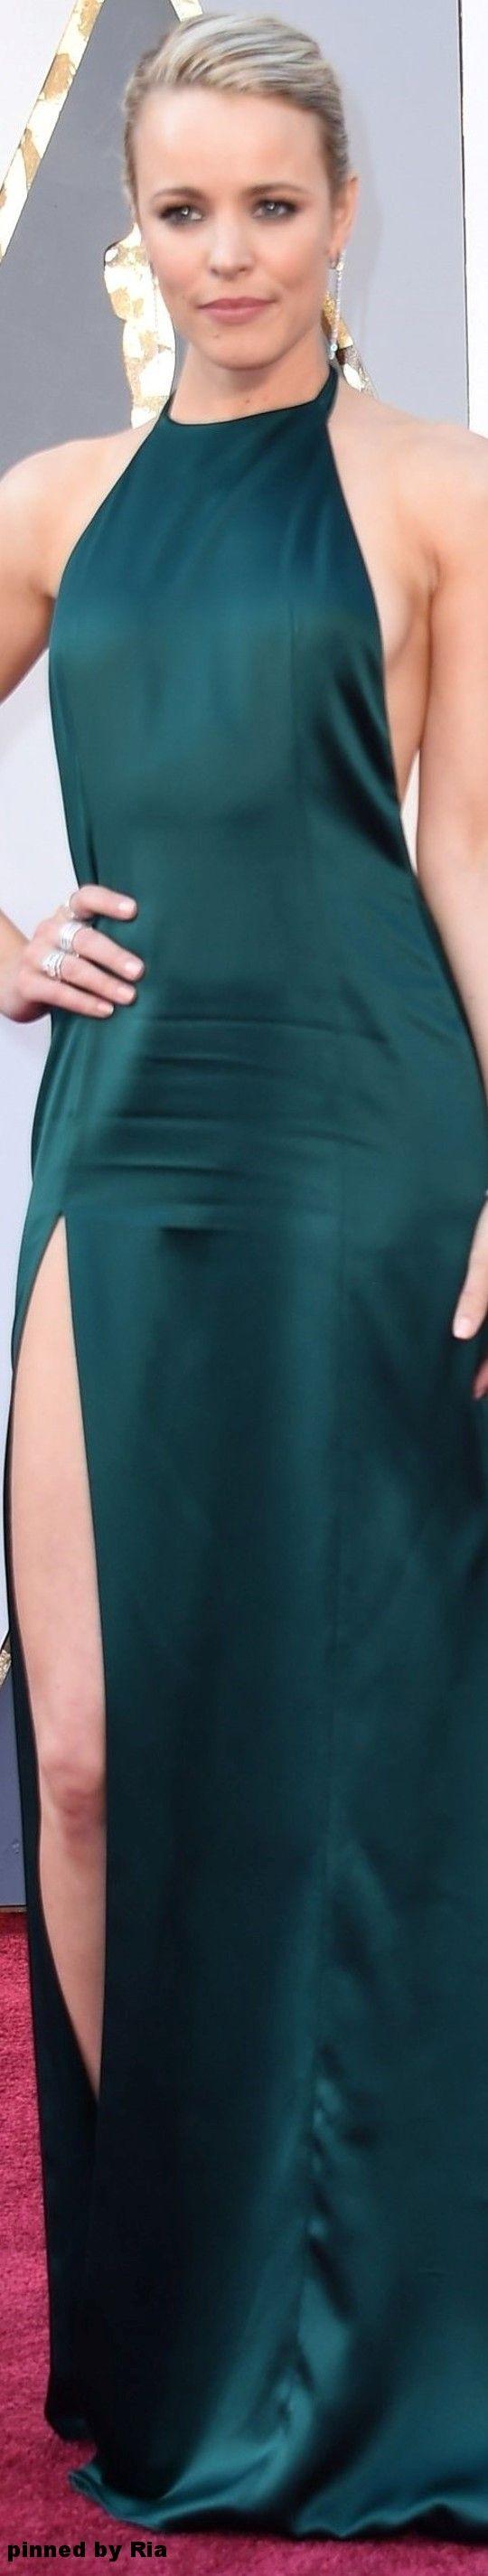 Rachel McAdams in August Getty Atelier l The 2016 Oscars l Ria